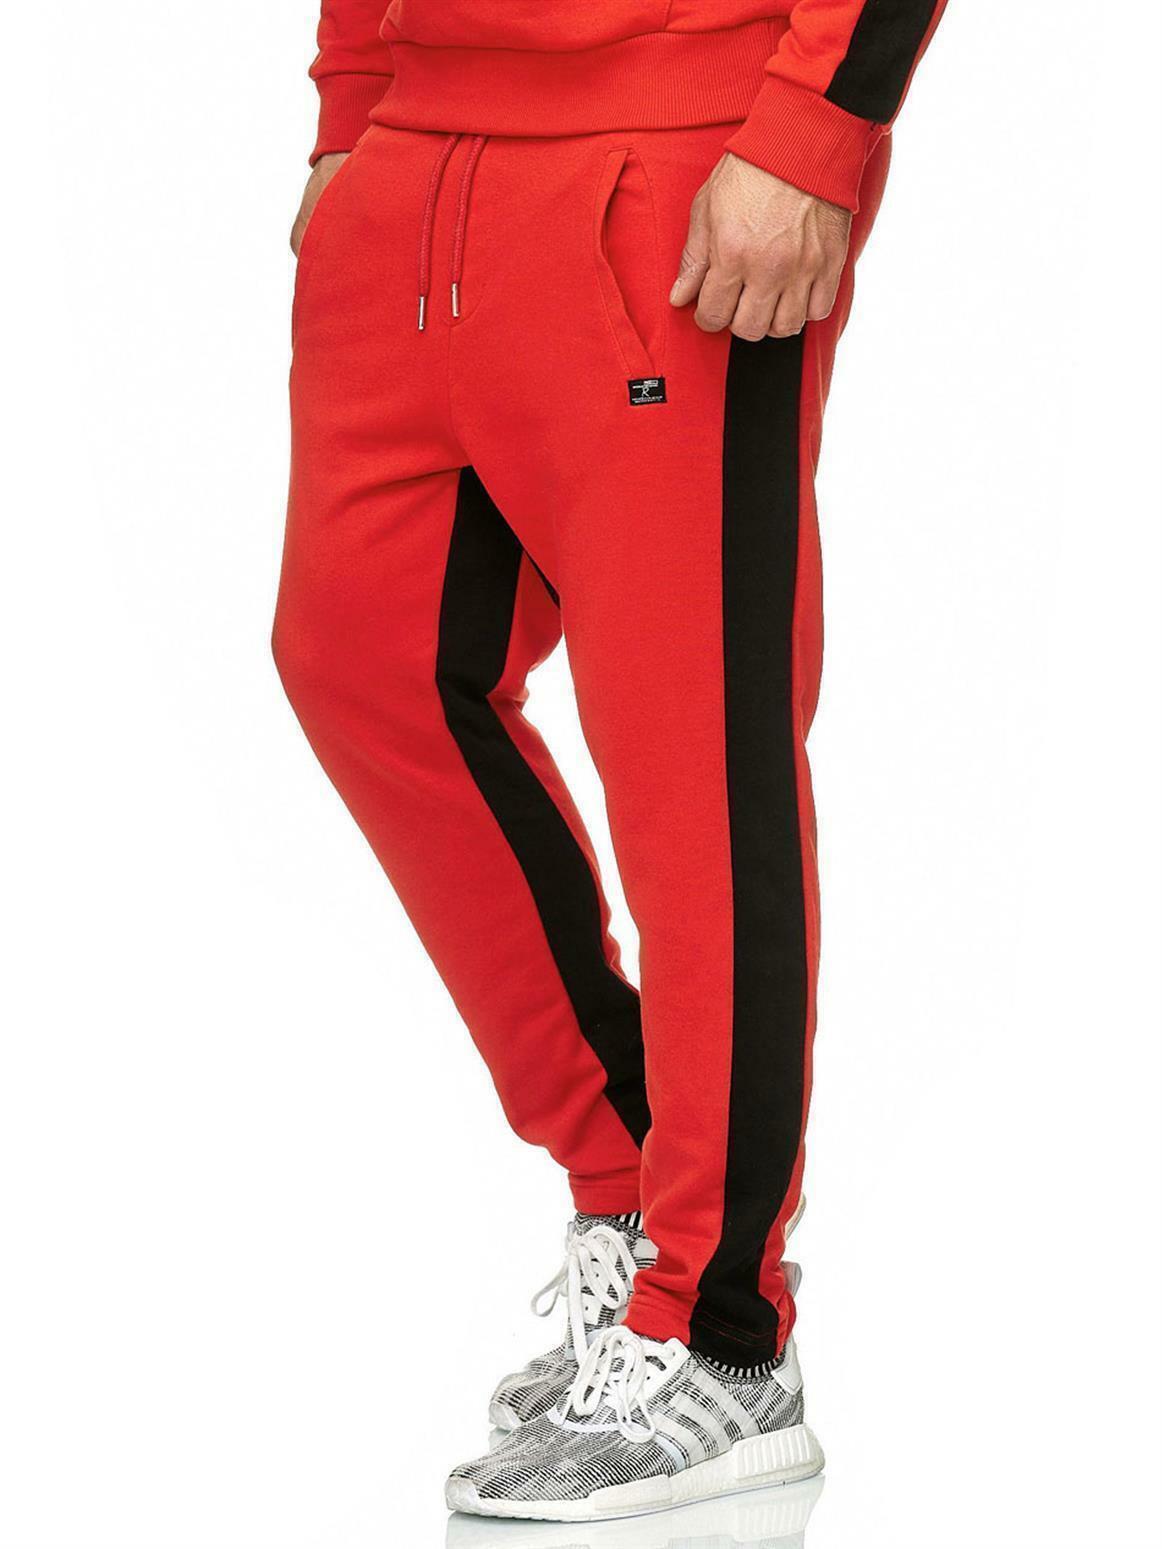 Hommes Coton Pantalon De Survêtement Pantalon De Jogging Pantalons Gym Fitness Sports Pantalon